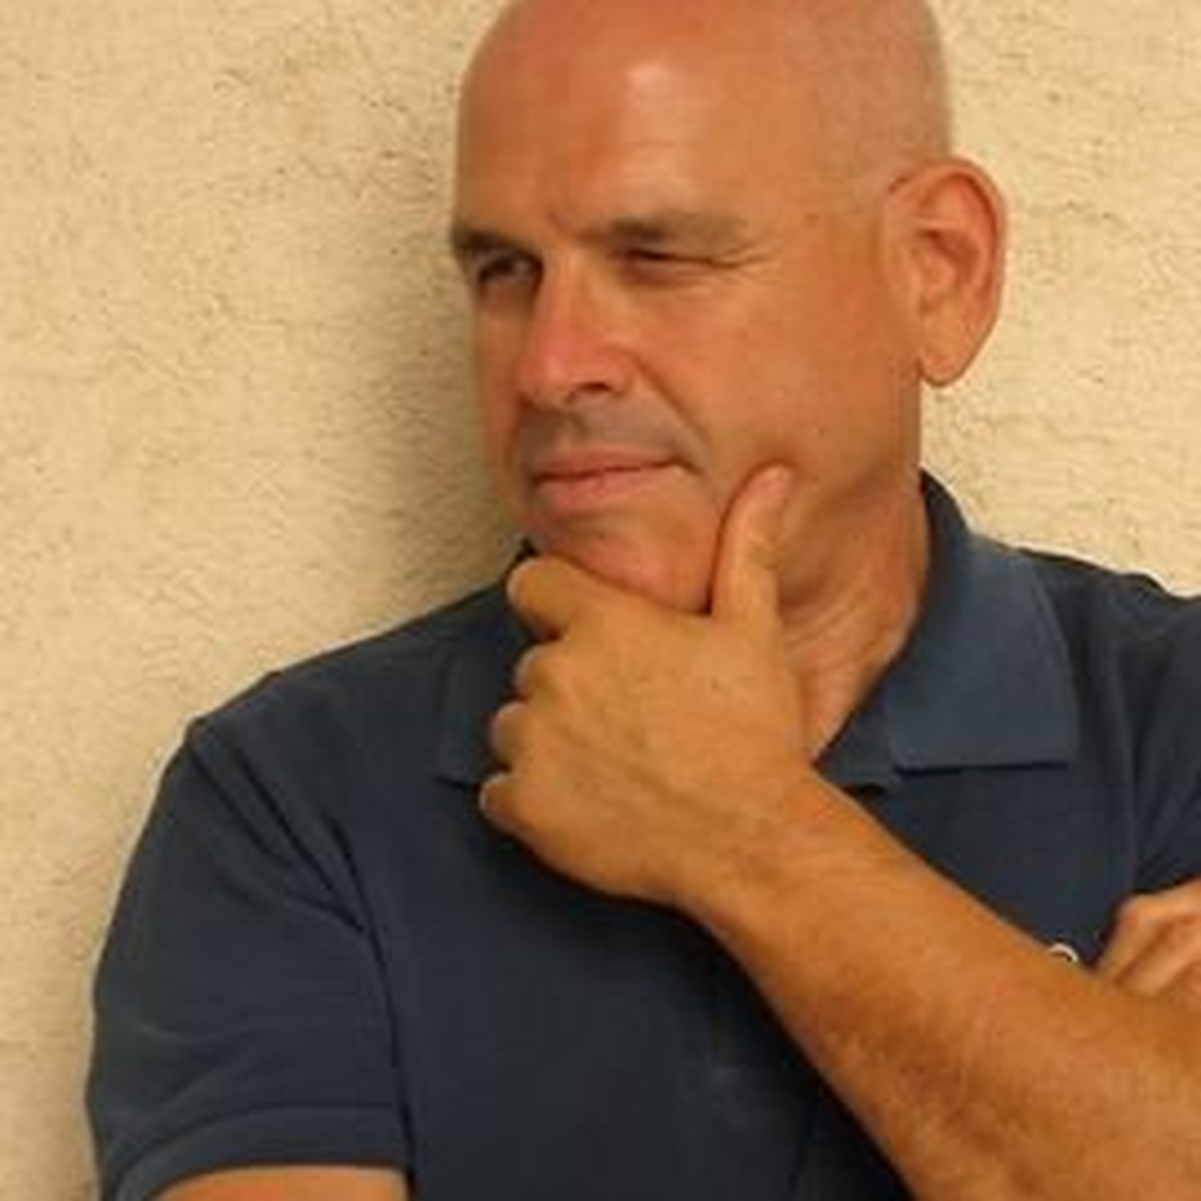 Shimon Schocken